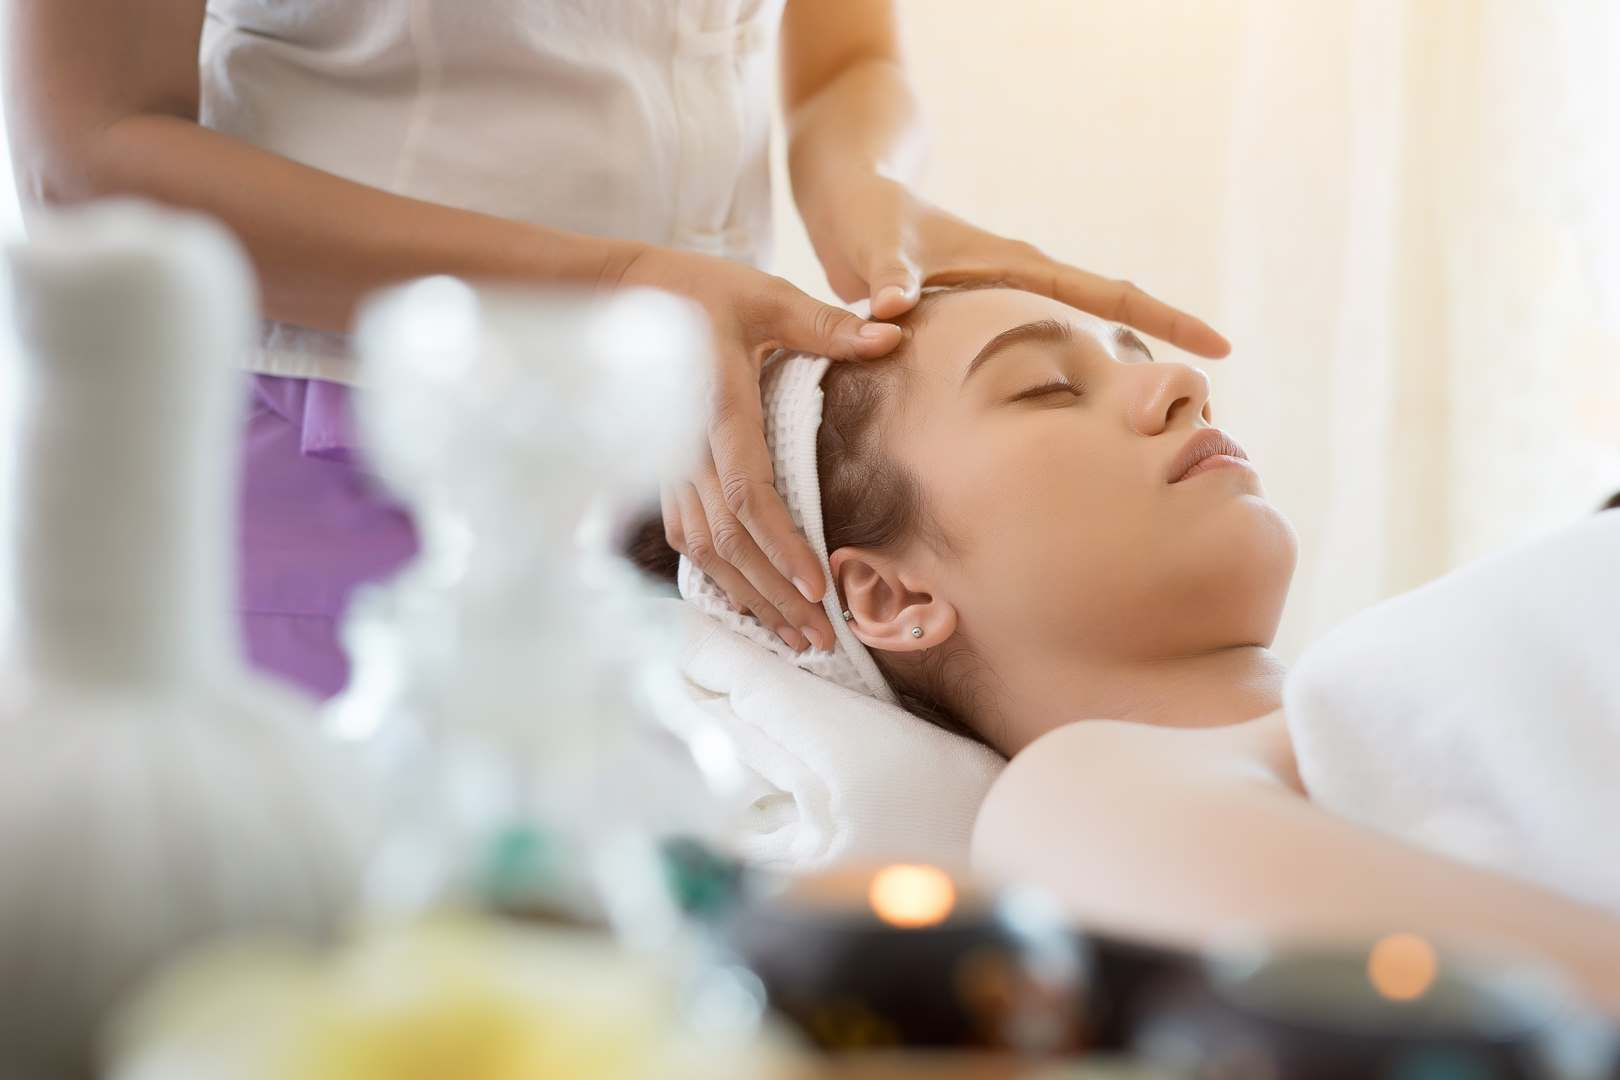 Fenomen masażu bańkami chińskimi